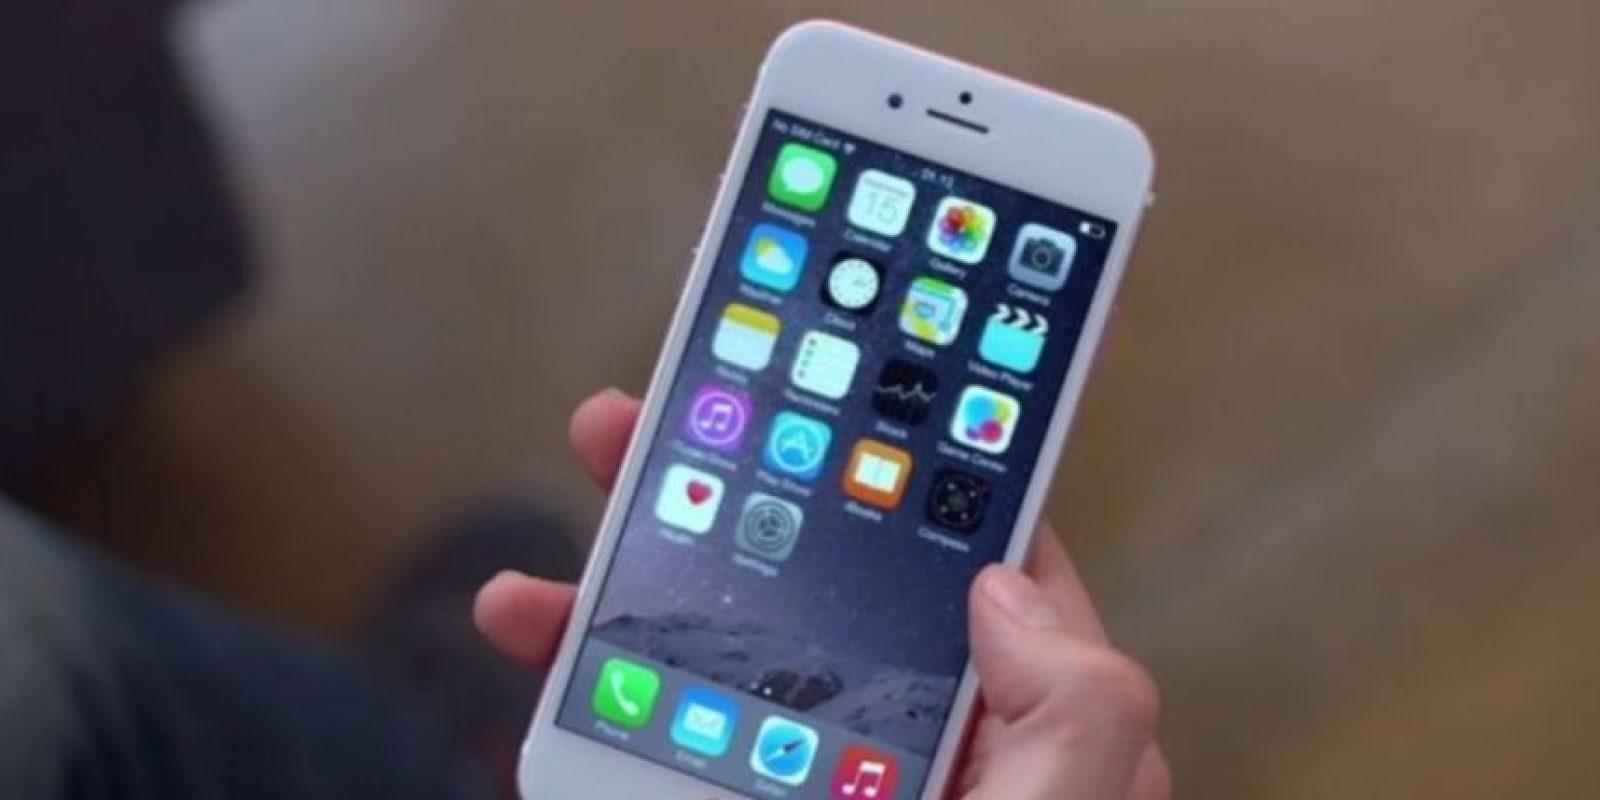 La interfaz es parecida a iOS. Foto:Jonathan Morrison / YouTube